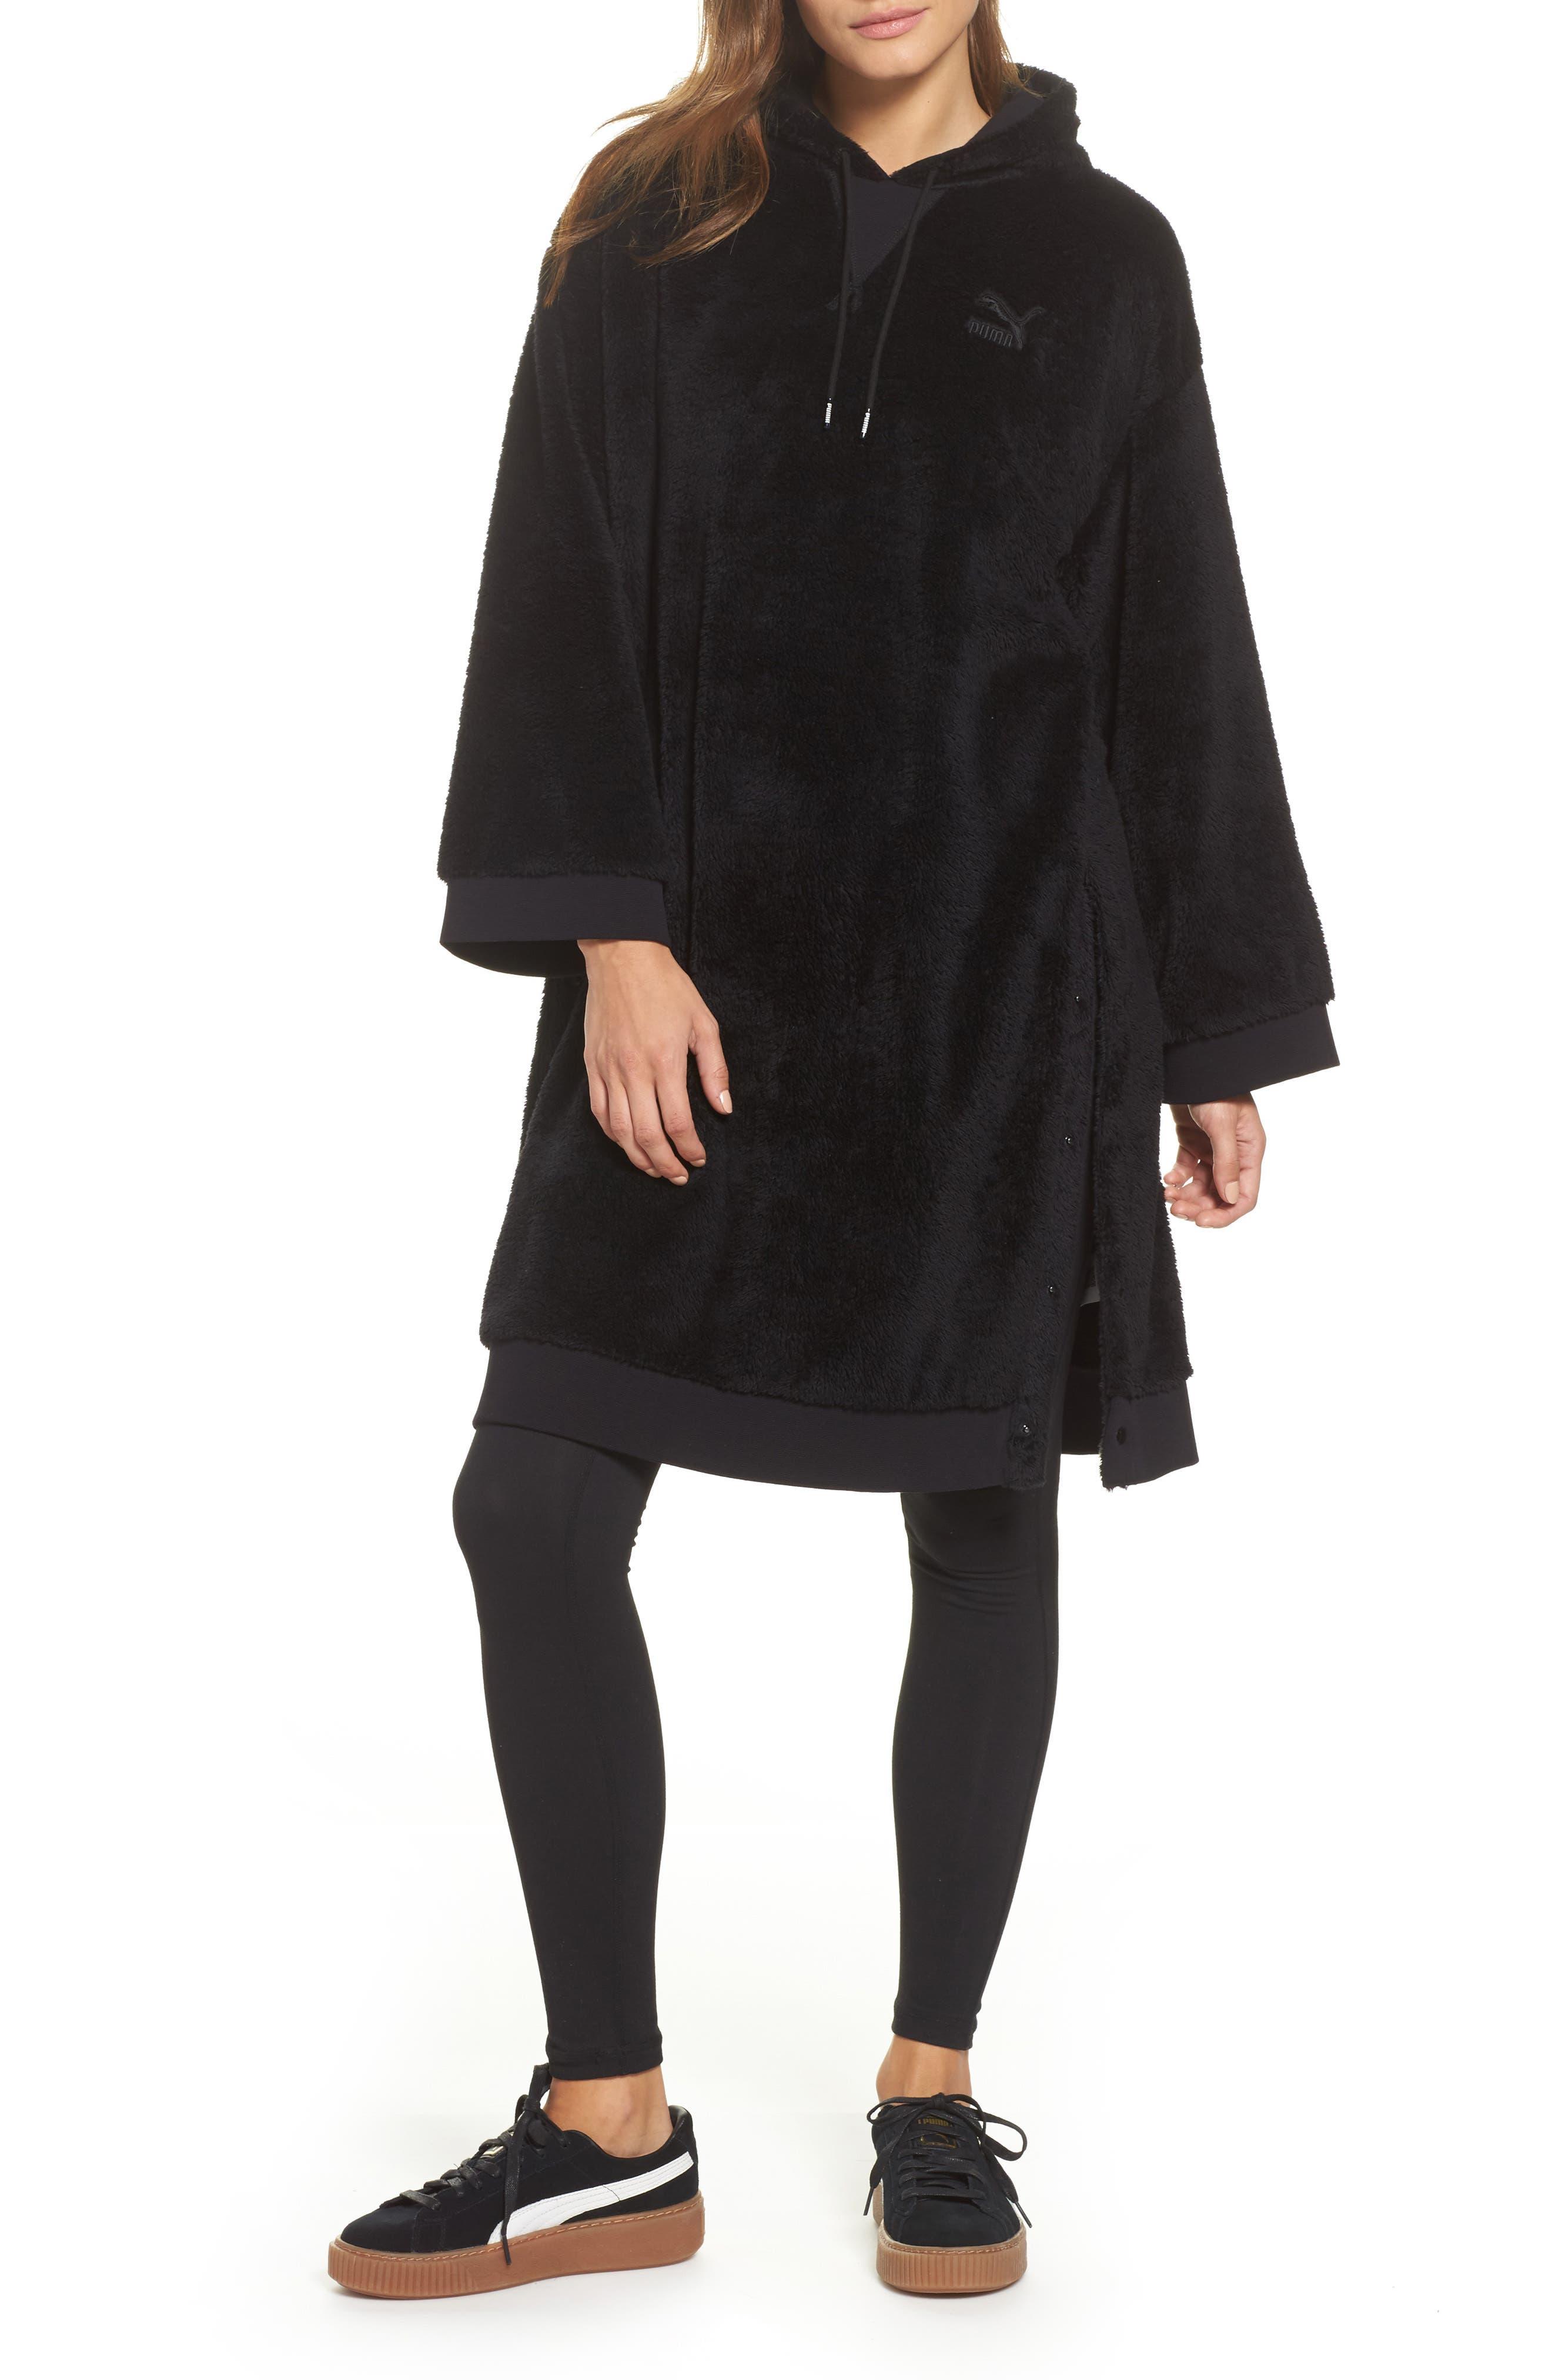 PUMA Fleece Oversize Hoodie